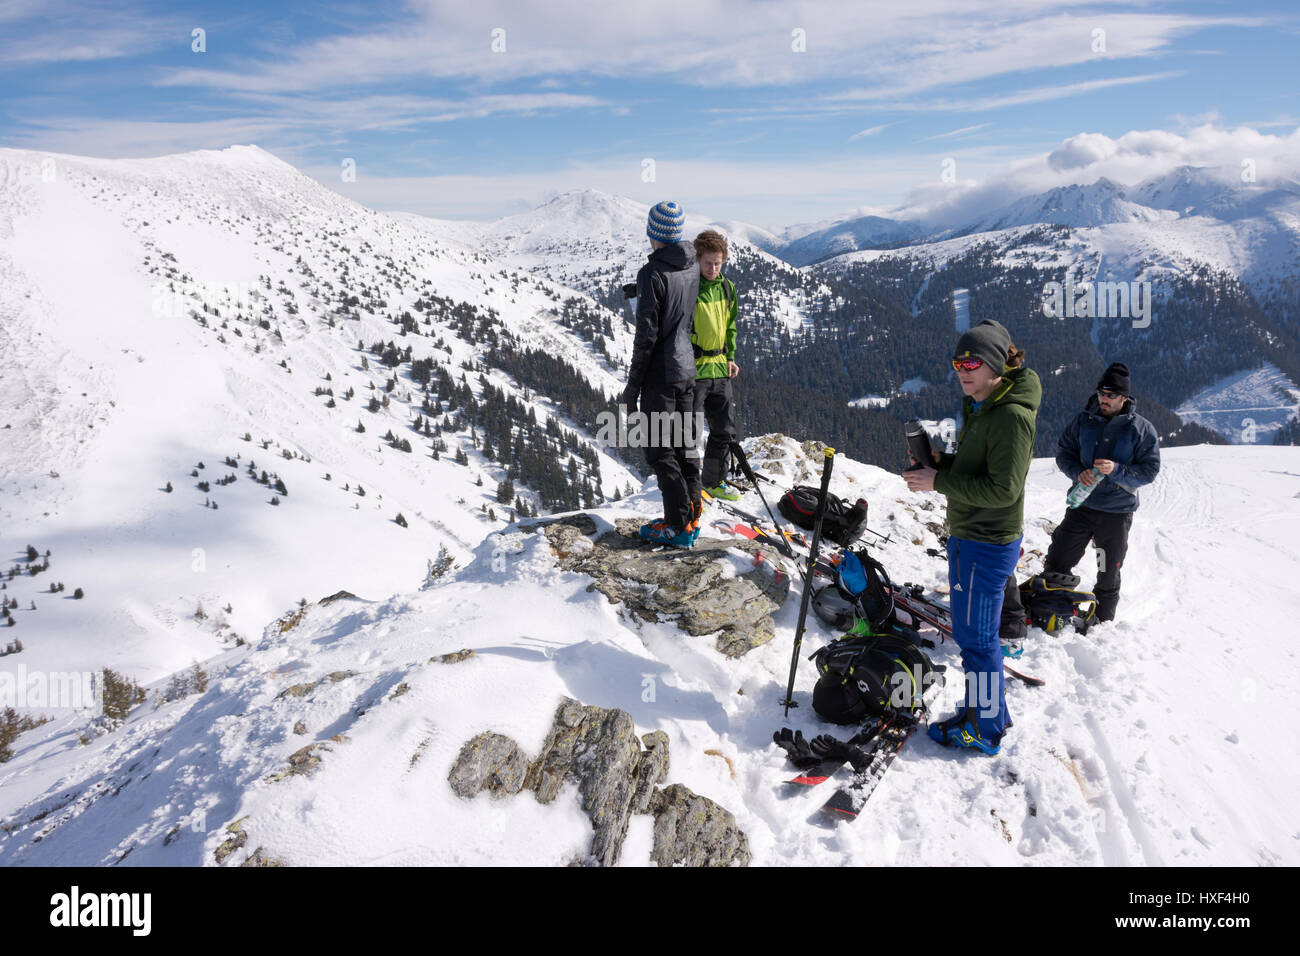 Group of ski mountaineers having a break on top of a snowy mountain, Triebenfeldkogel, Styrian Alps, Austria. Stock Photo